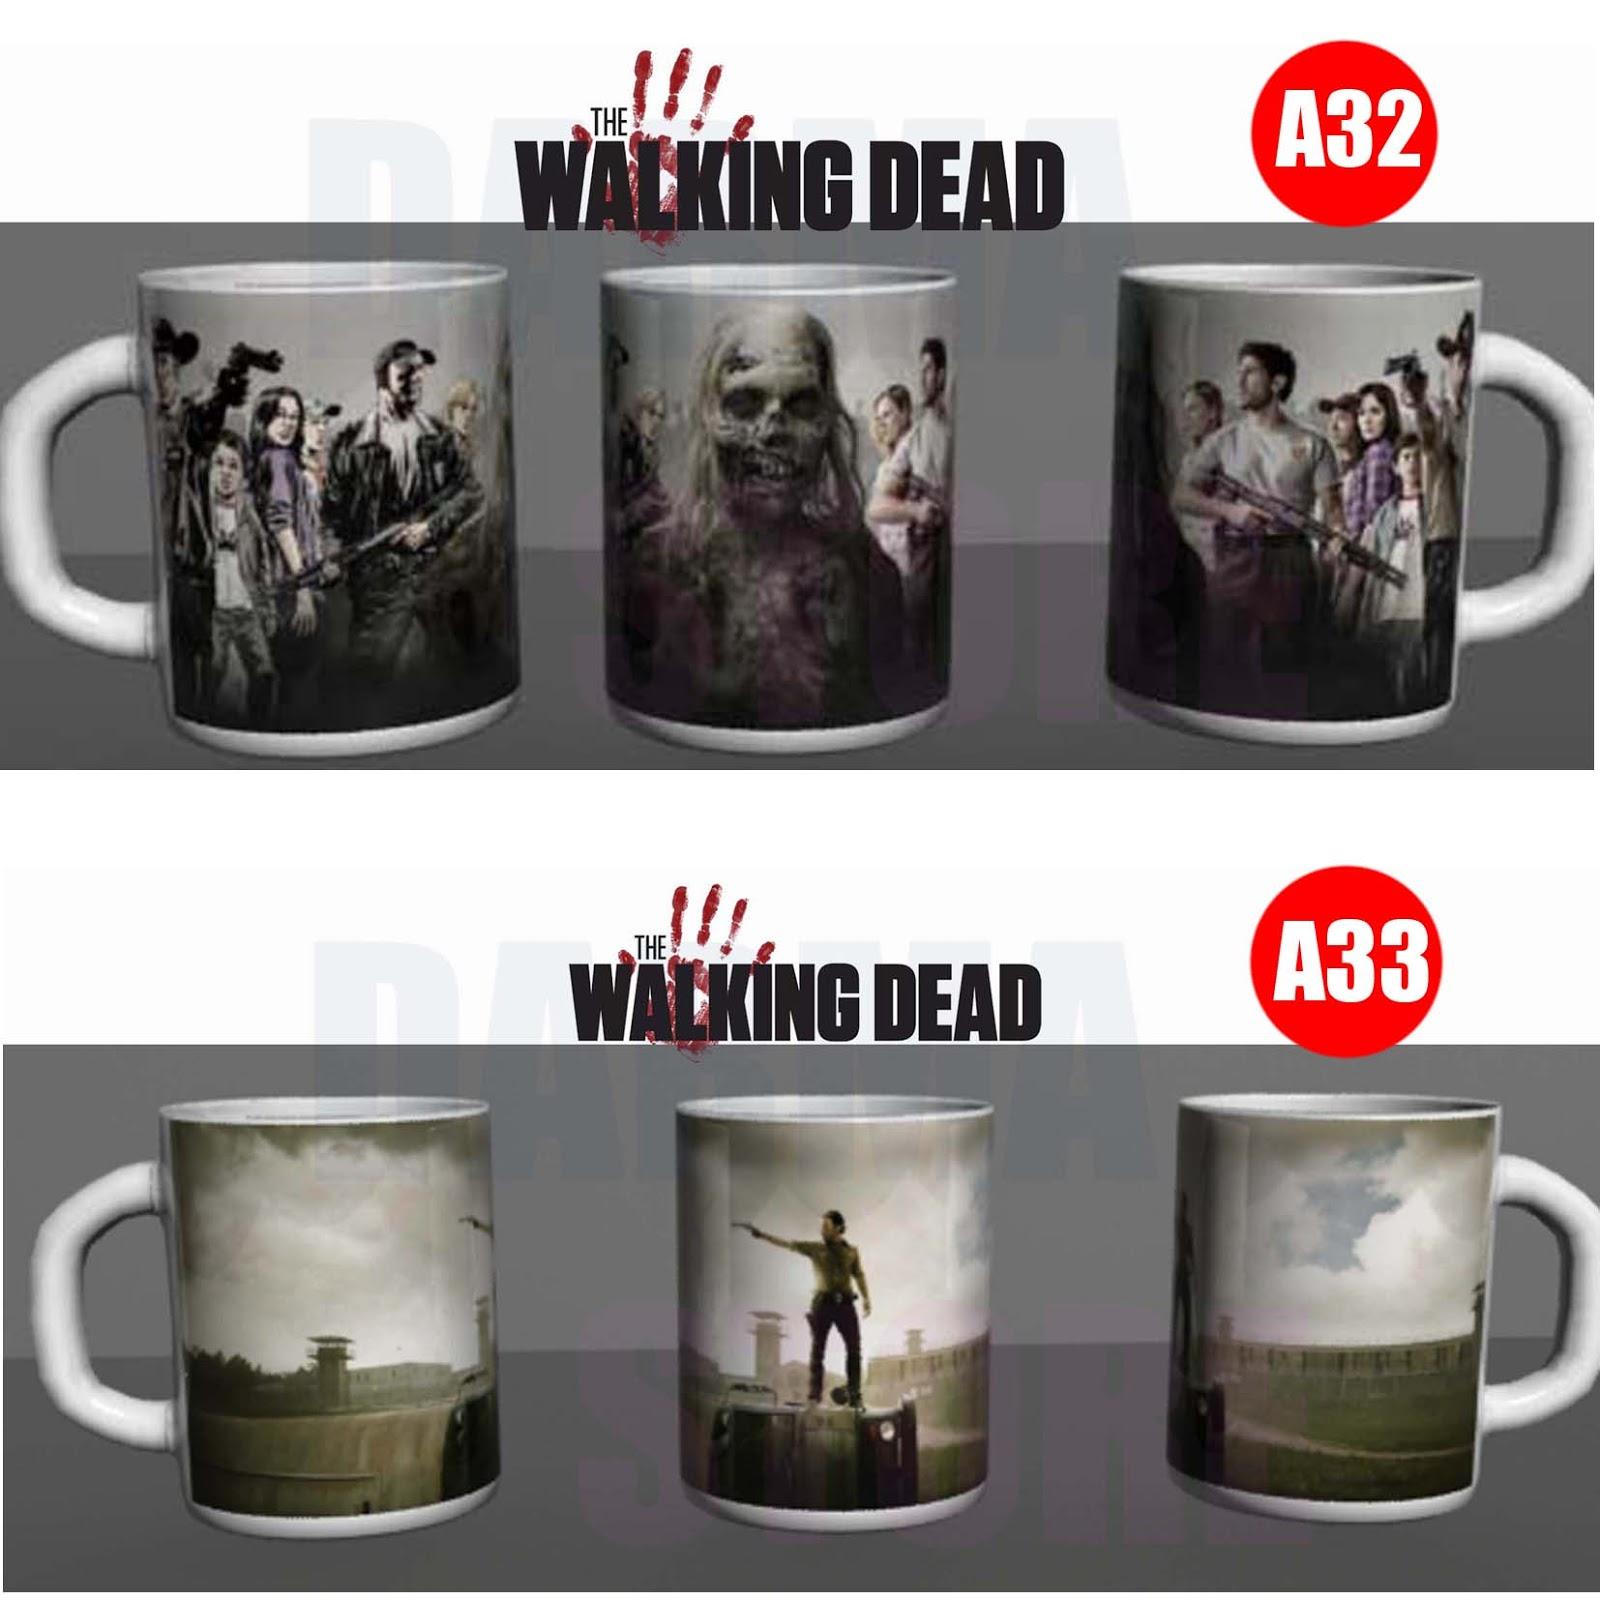 Is The Walking Dead A Sequel To Breaking Bad Youtube: Friends, Himym, Got, Breaking Bad Twd E